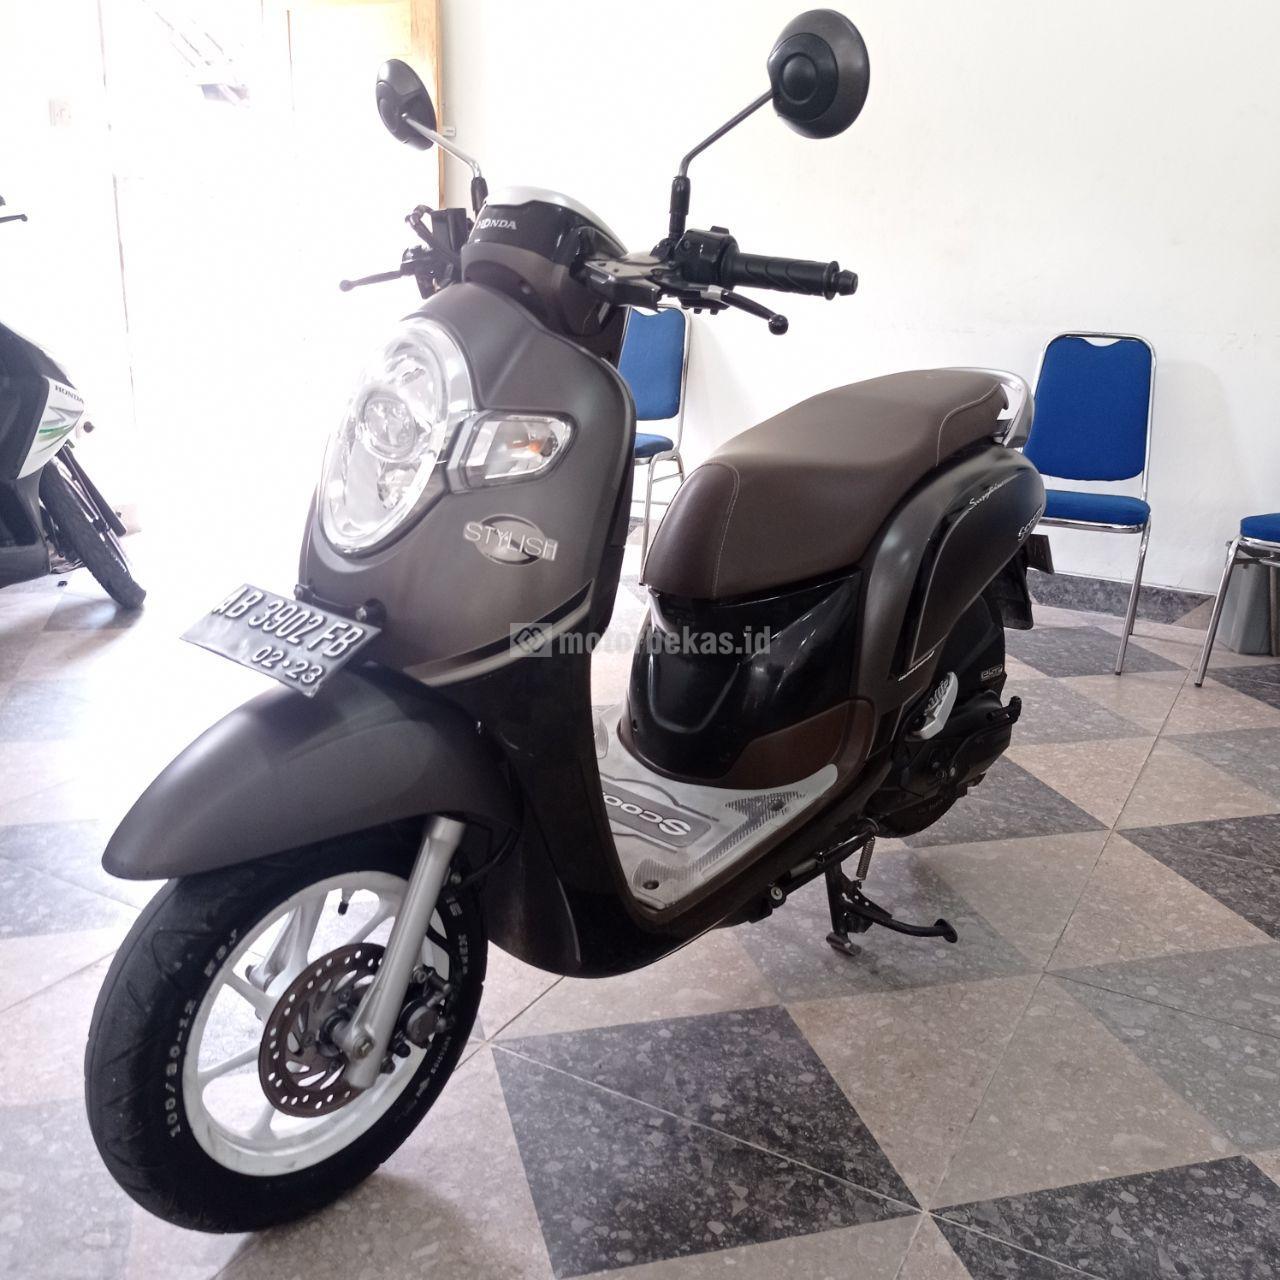 HONDA SCOOPY STYLISH 2018 motorbekas.id